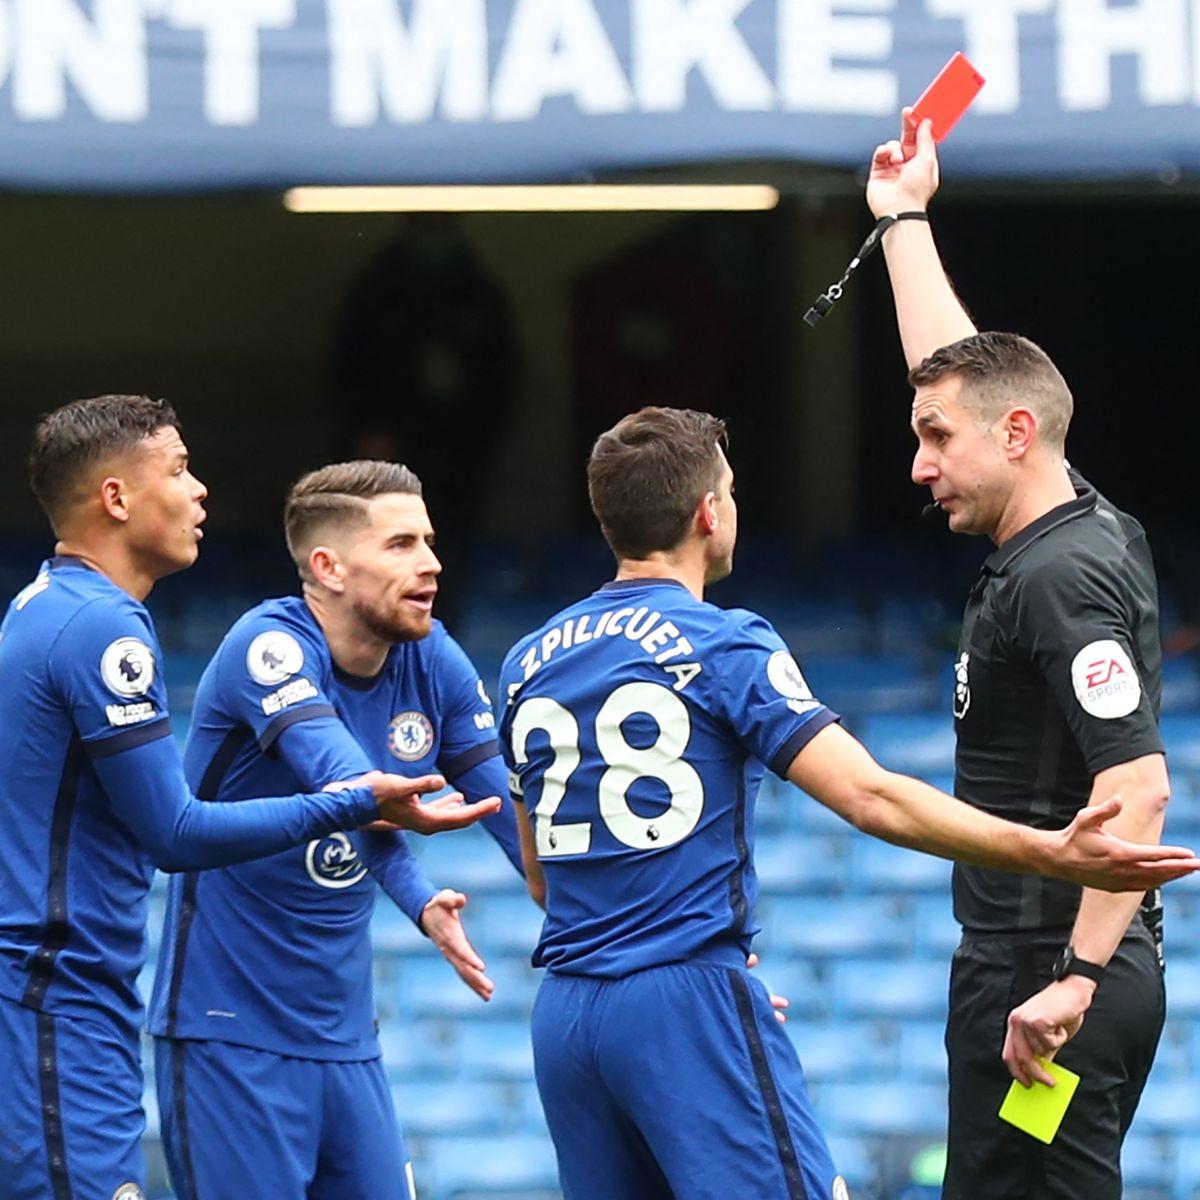 'Does Thiago Silva support West Brom!?': Fans mock Chelsea's 'cursed' defender. 46